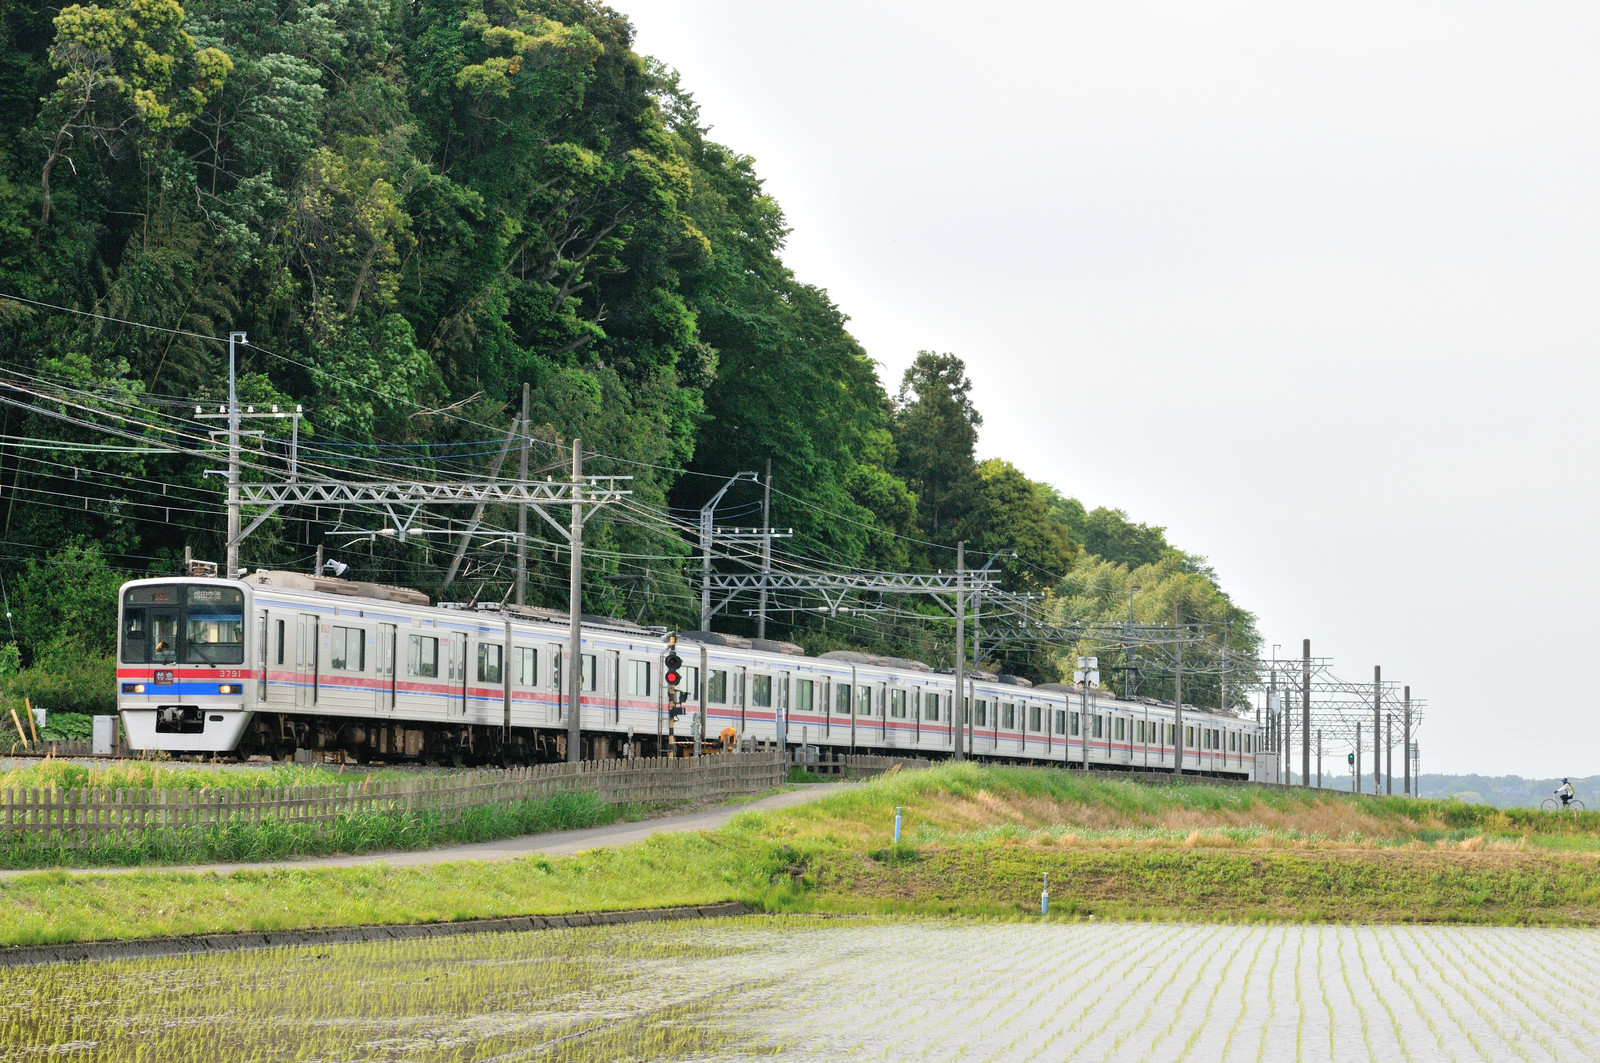 https://livedoor.blogimg.jp/h_nekomata/imgs/2/5/25db083d.jpg